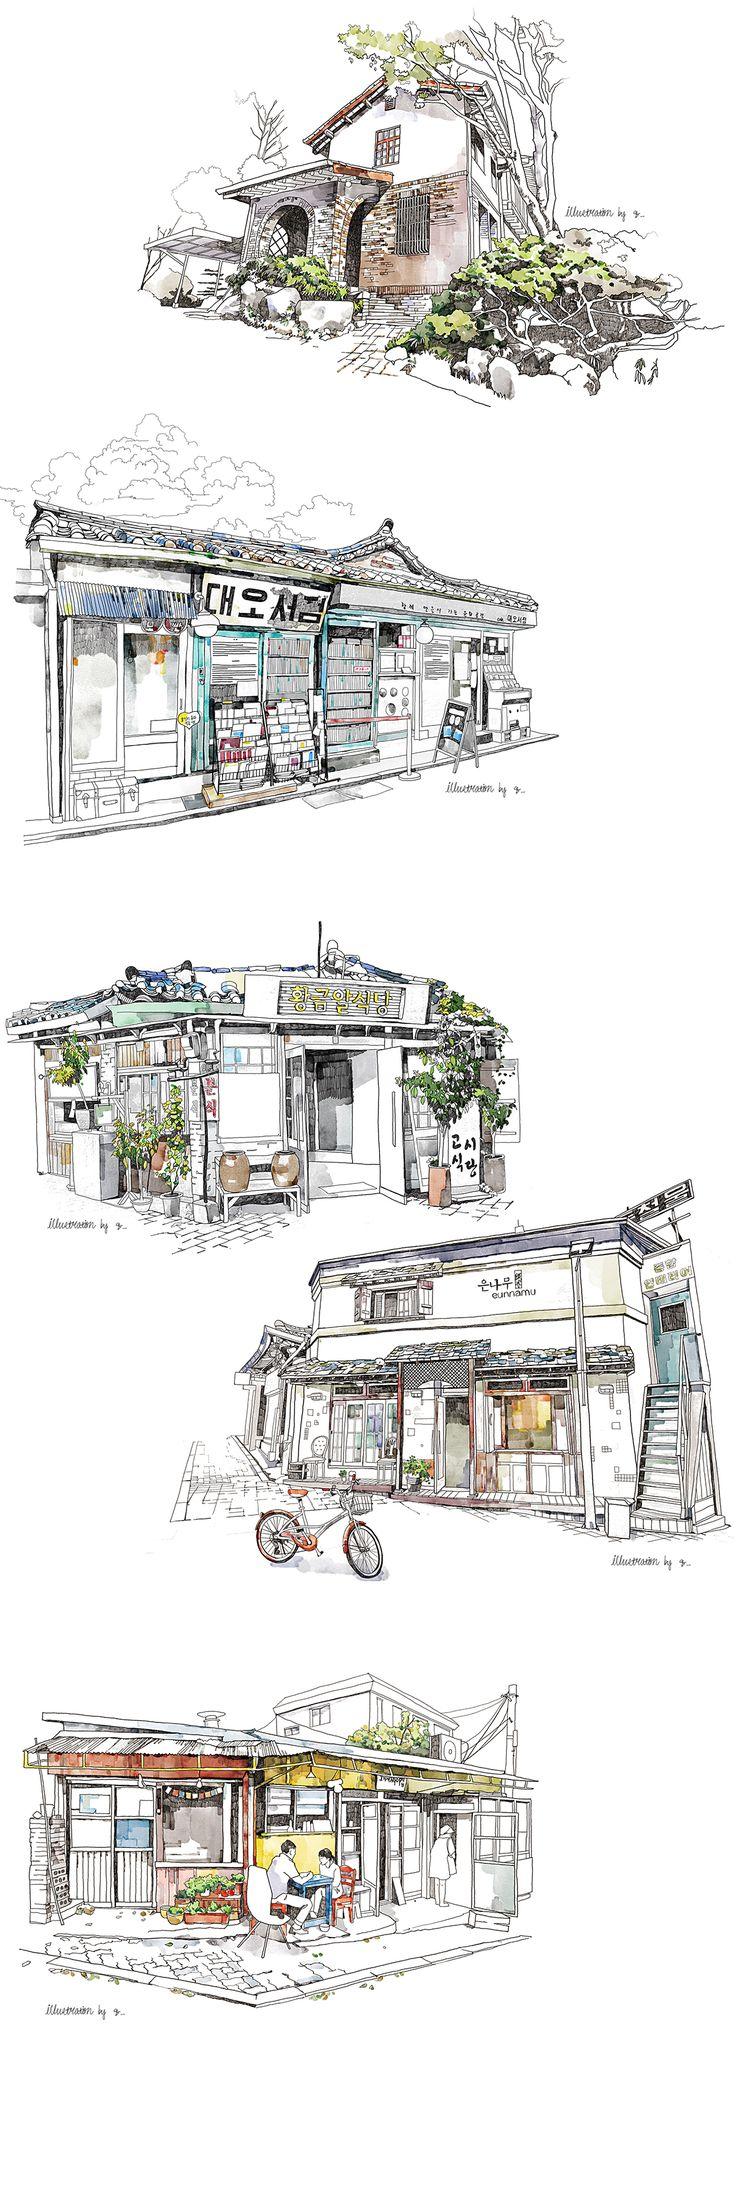 urban sketches on Behance